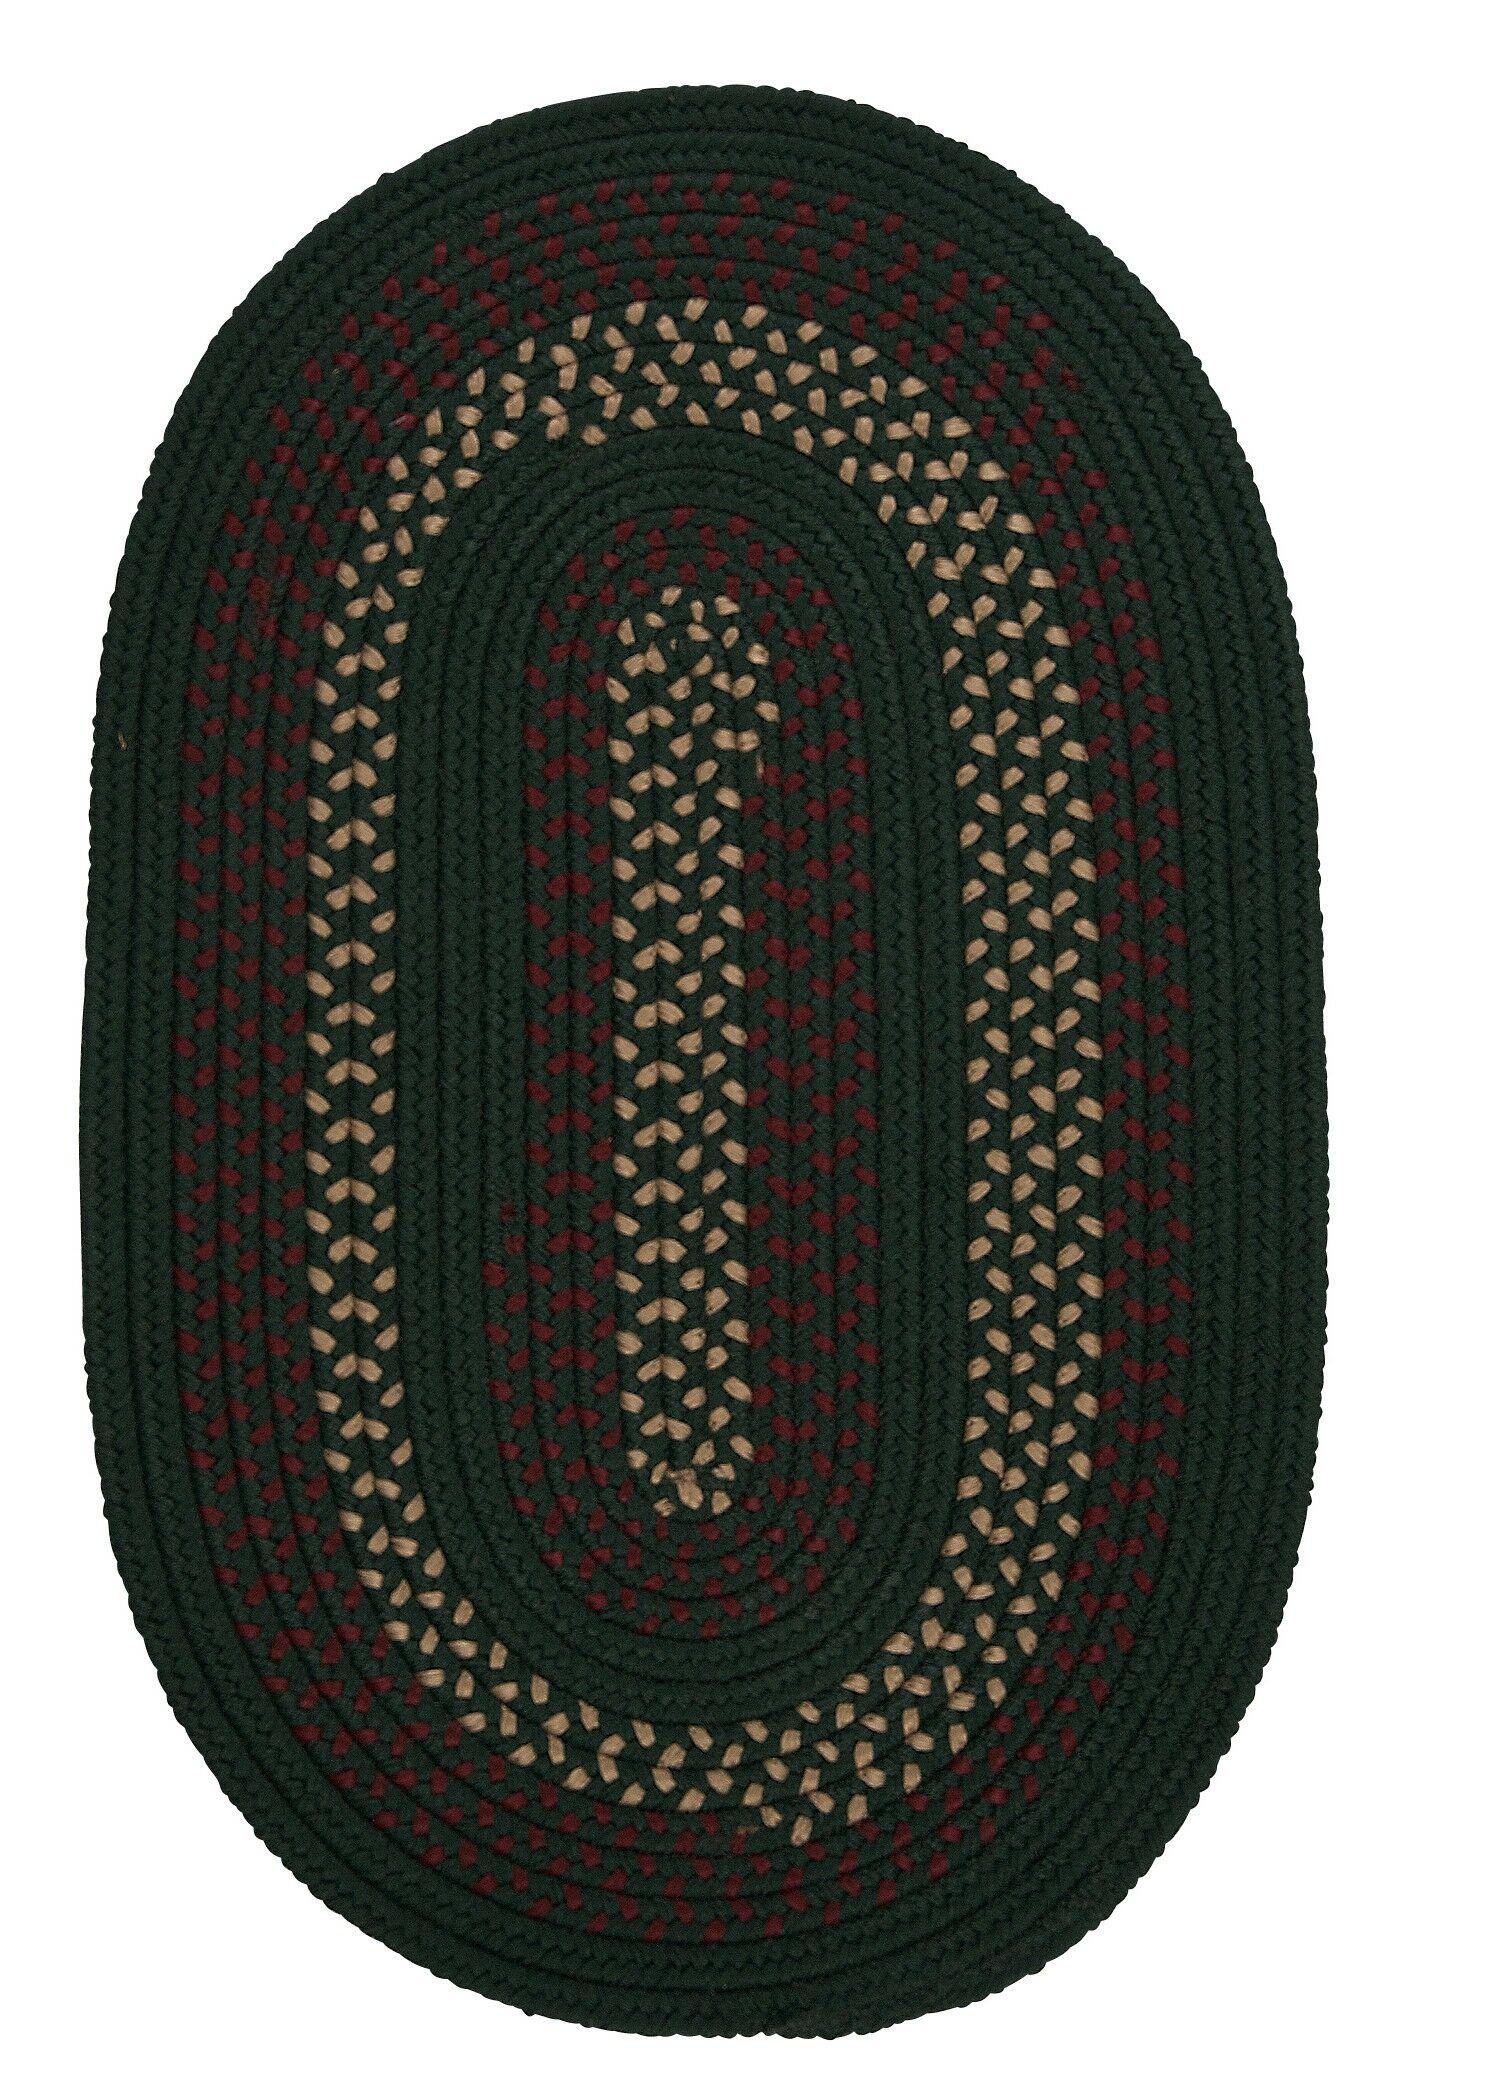 Omaha Hunter Green Indoor/Outdoor Area Rug Rug Size: Round 12'